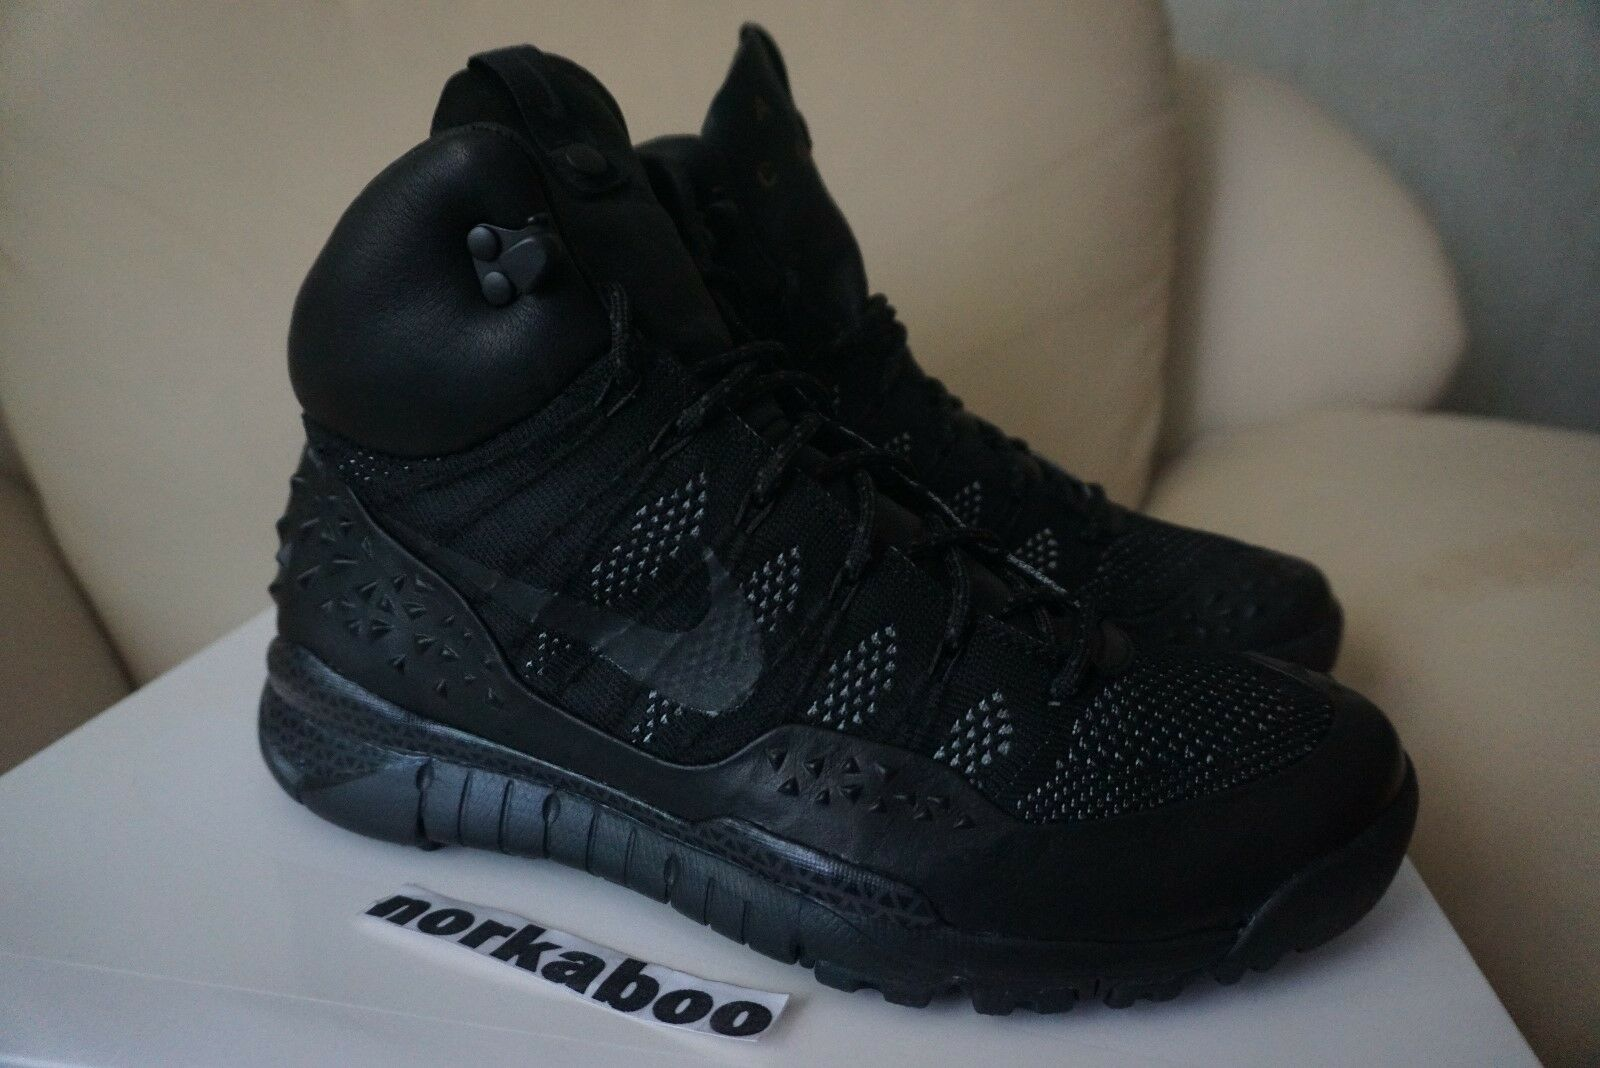 Nike Lupinek Flyknit ACG Boot Black Anthracite 826077-001 nikelab DS